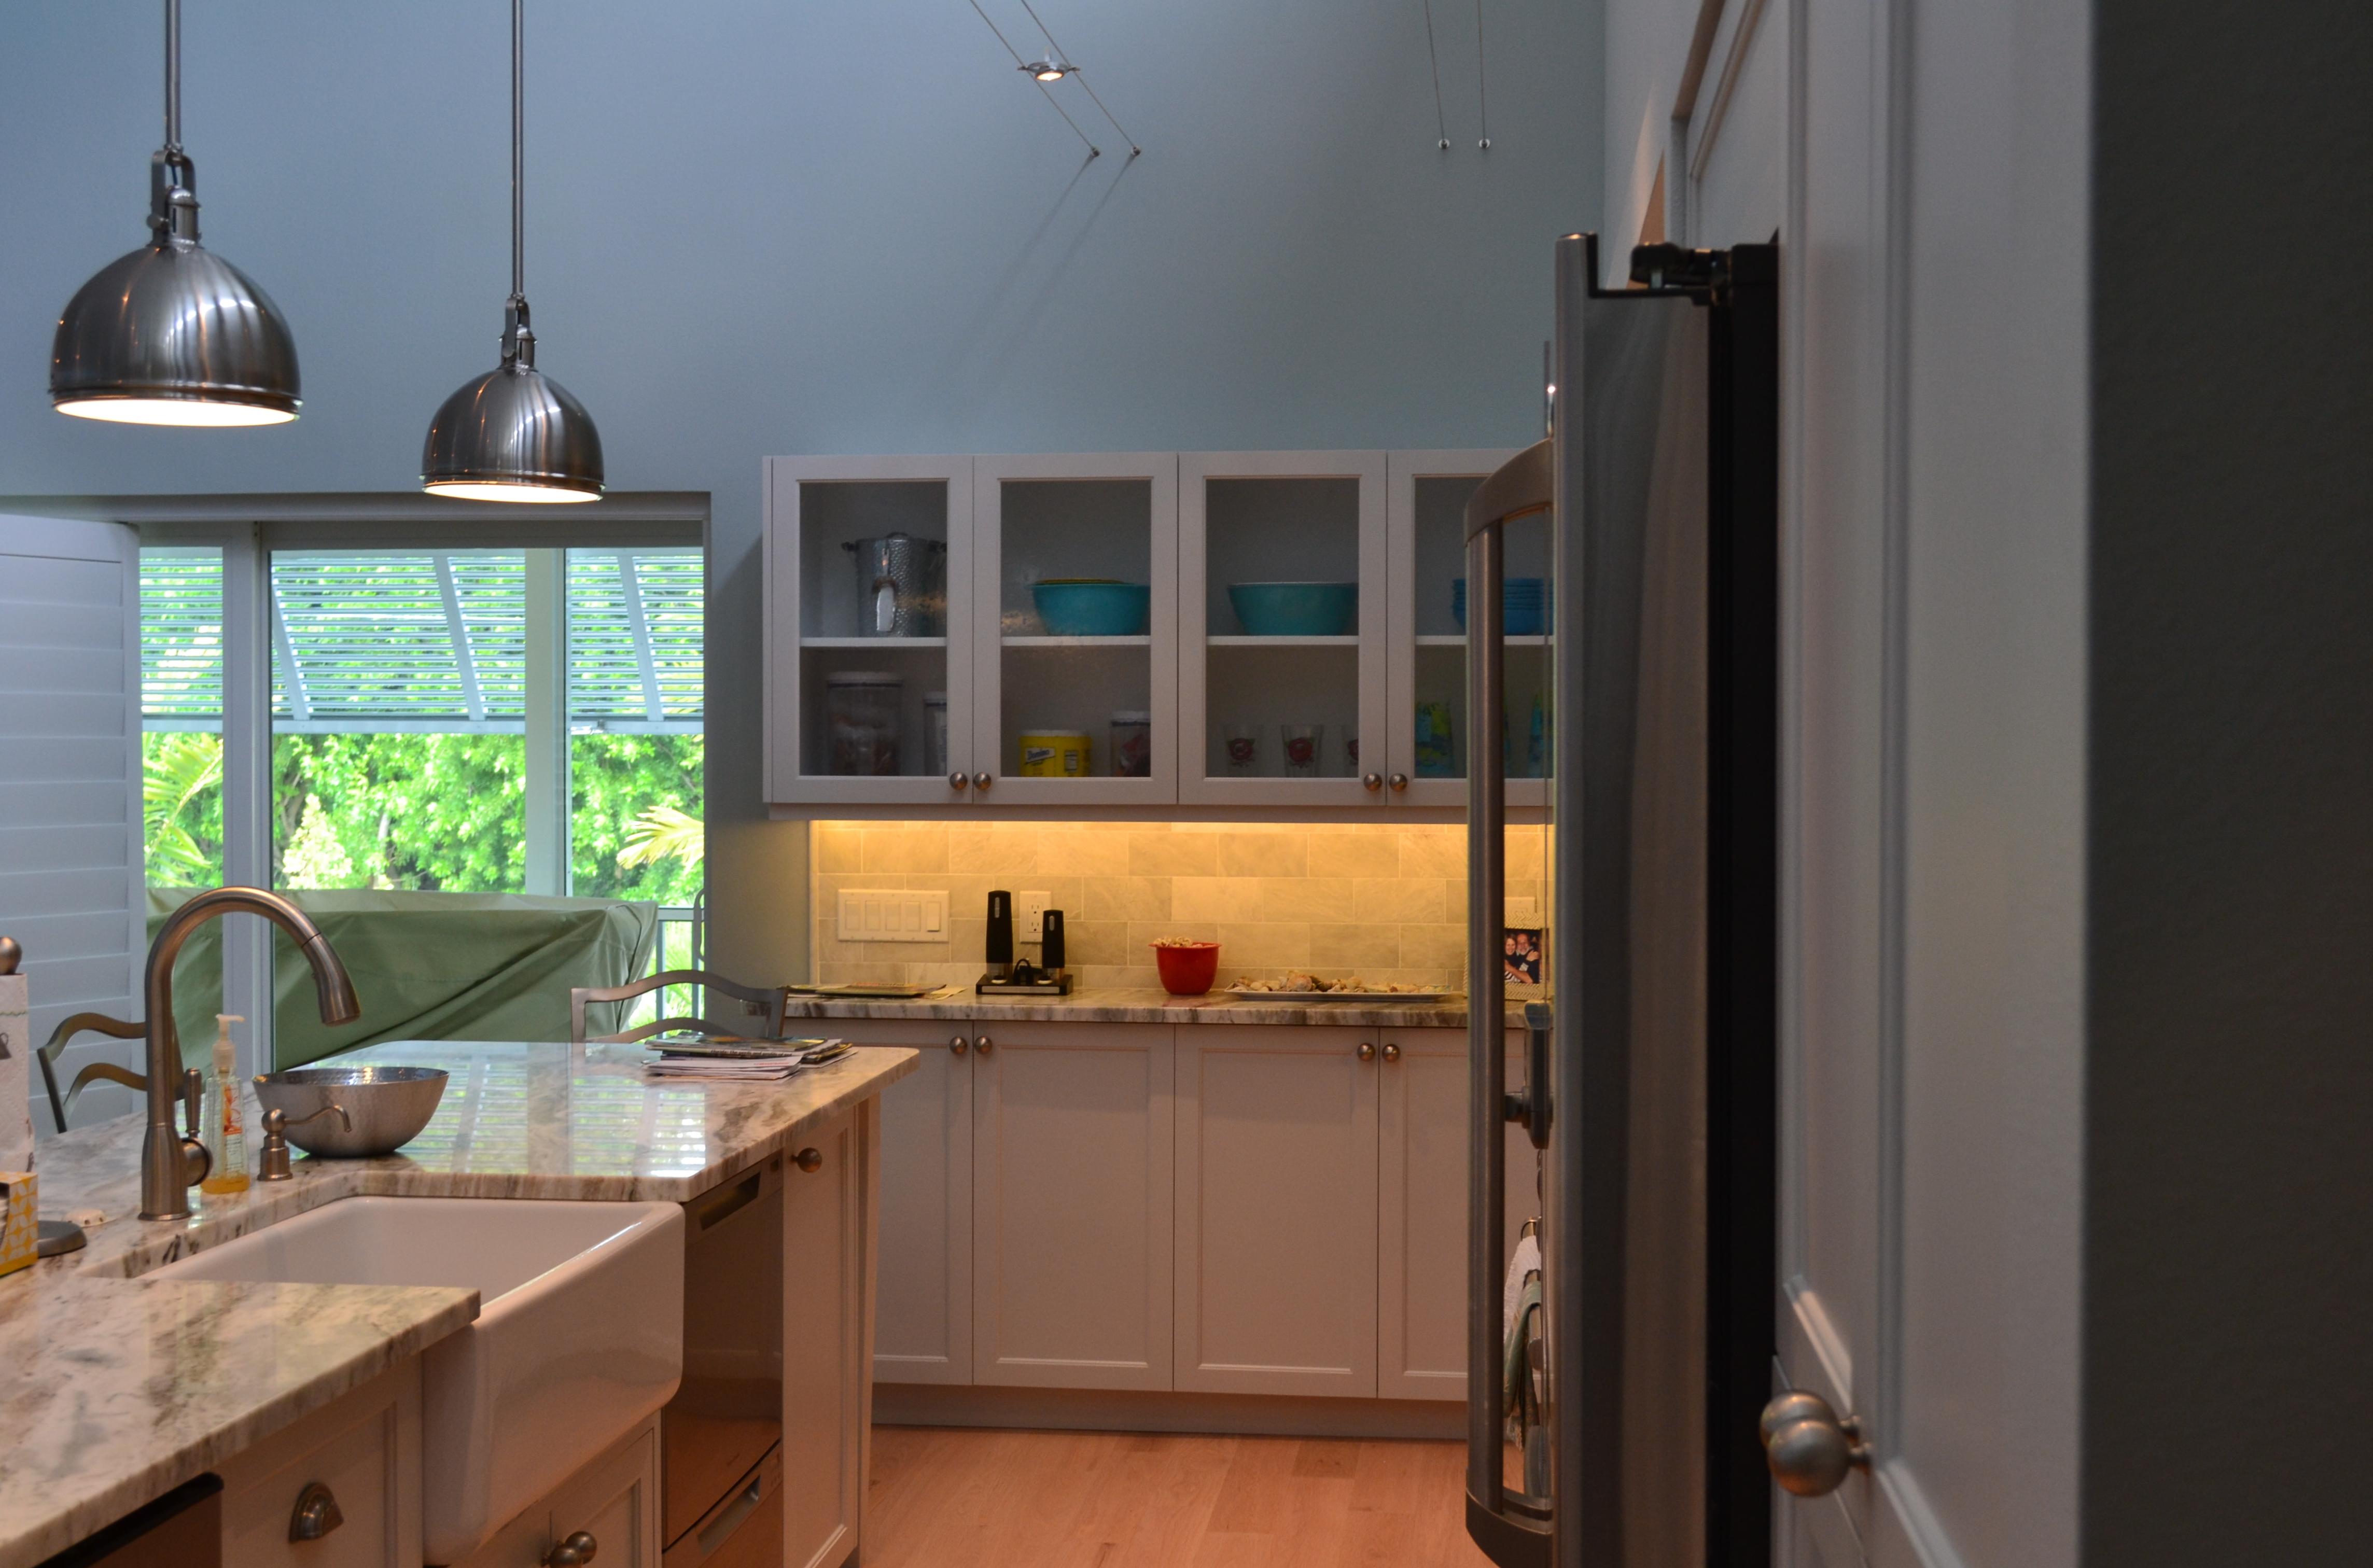 Leibentritt kitchen (3)